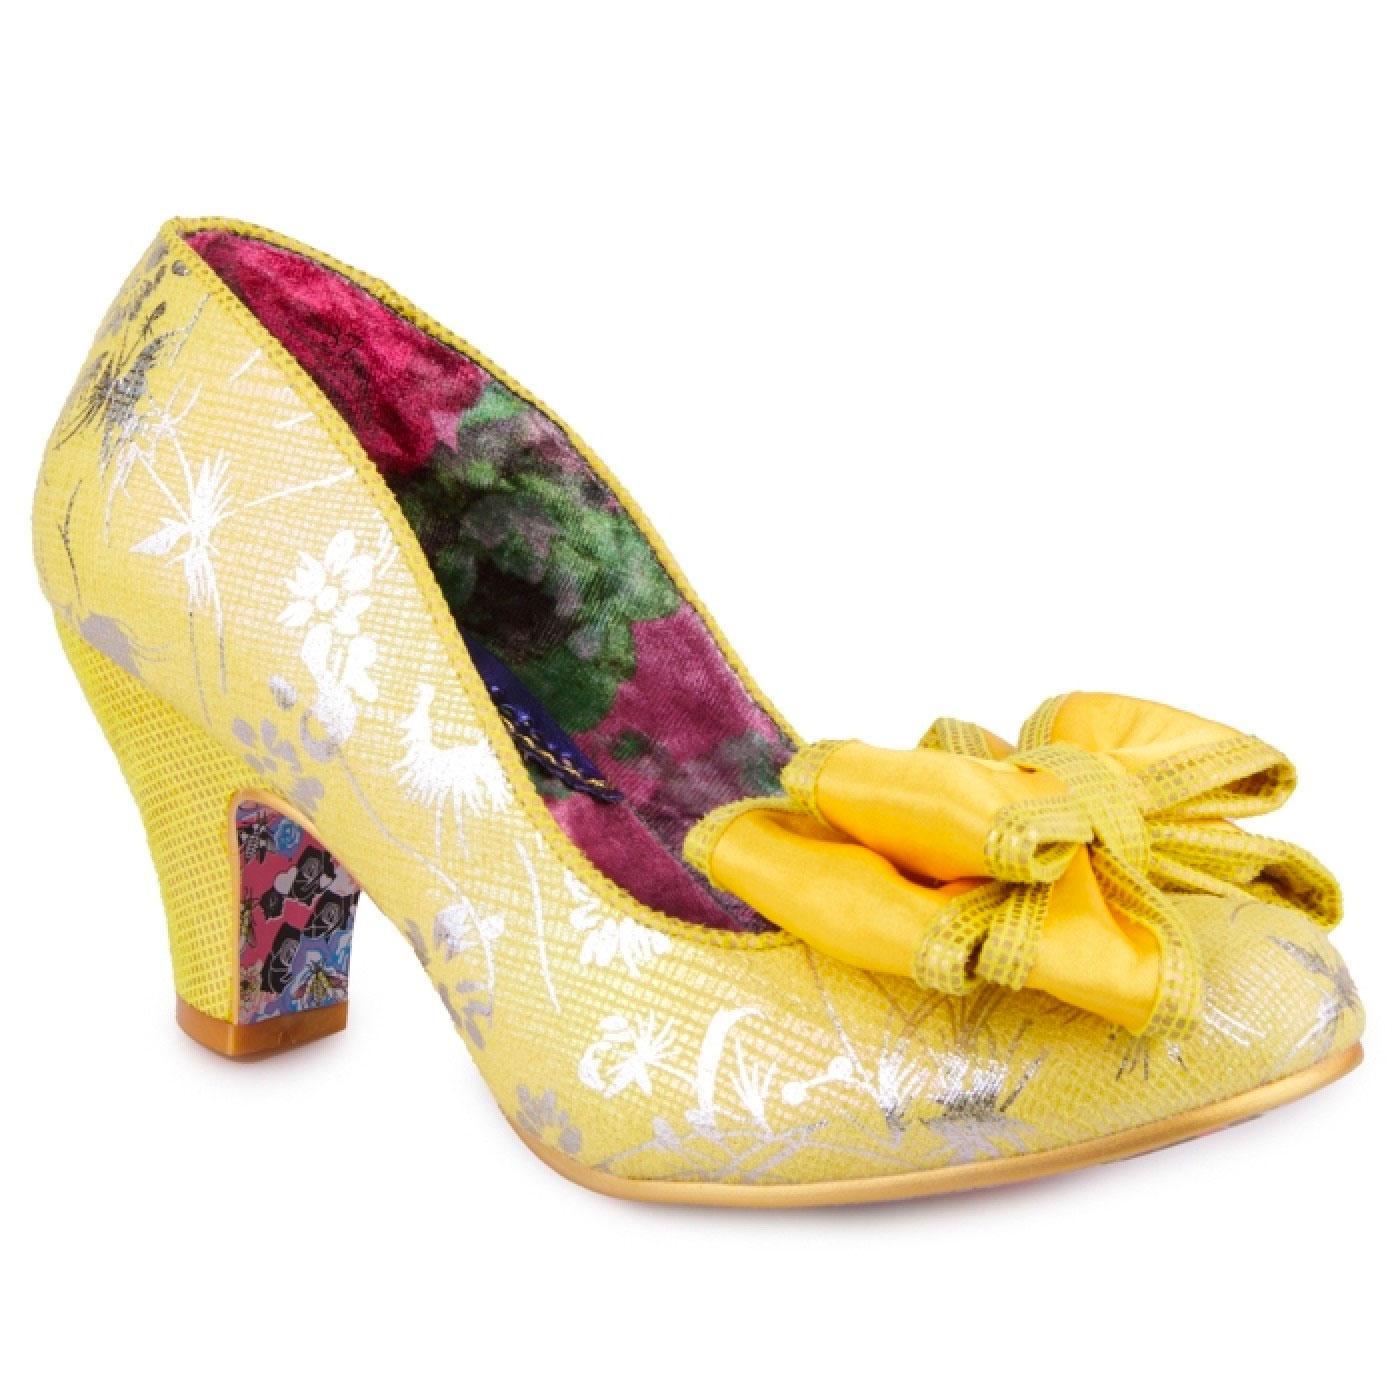 Ban Joe IRREGULAR CHOICE Fabric Floral Shoes (Y)